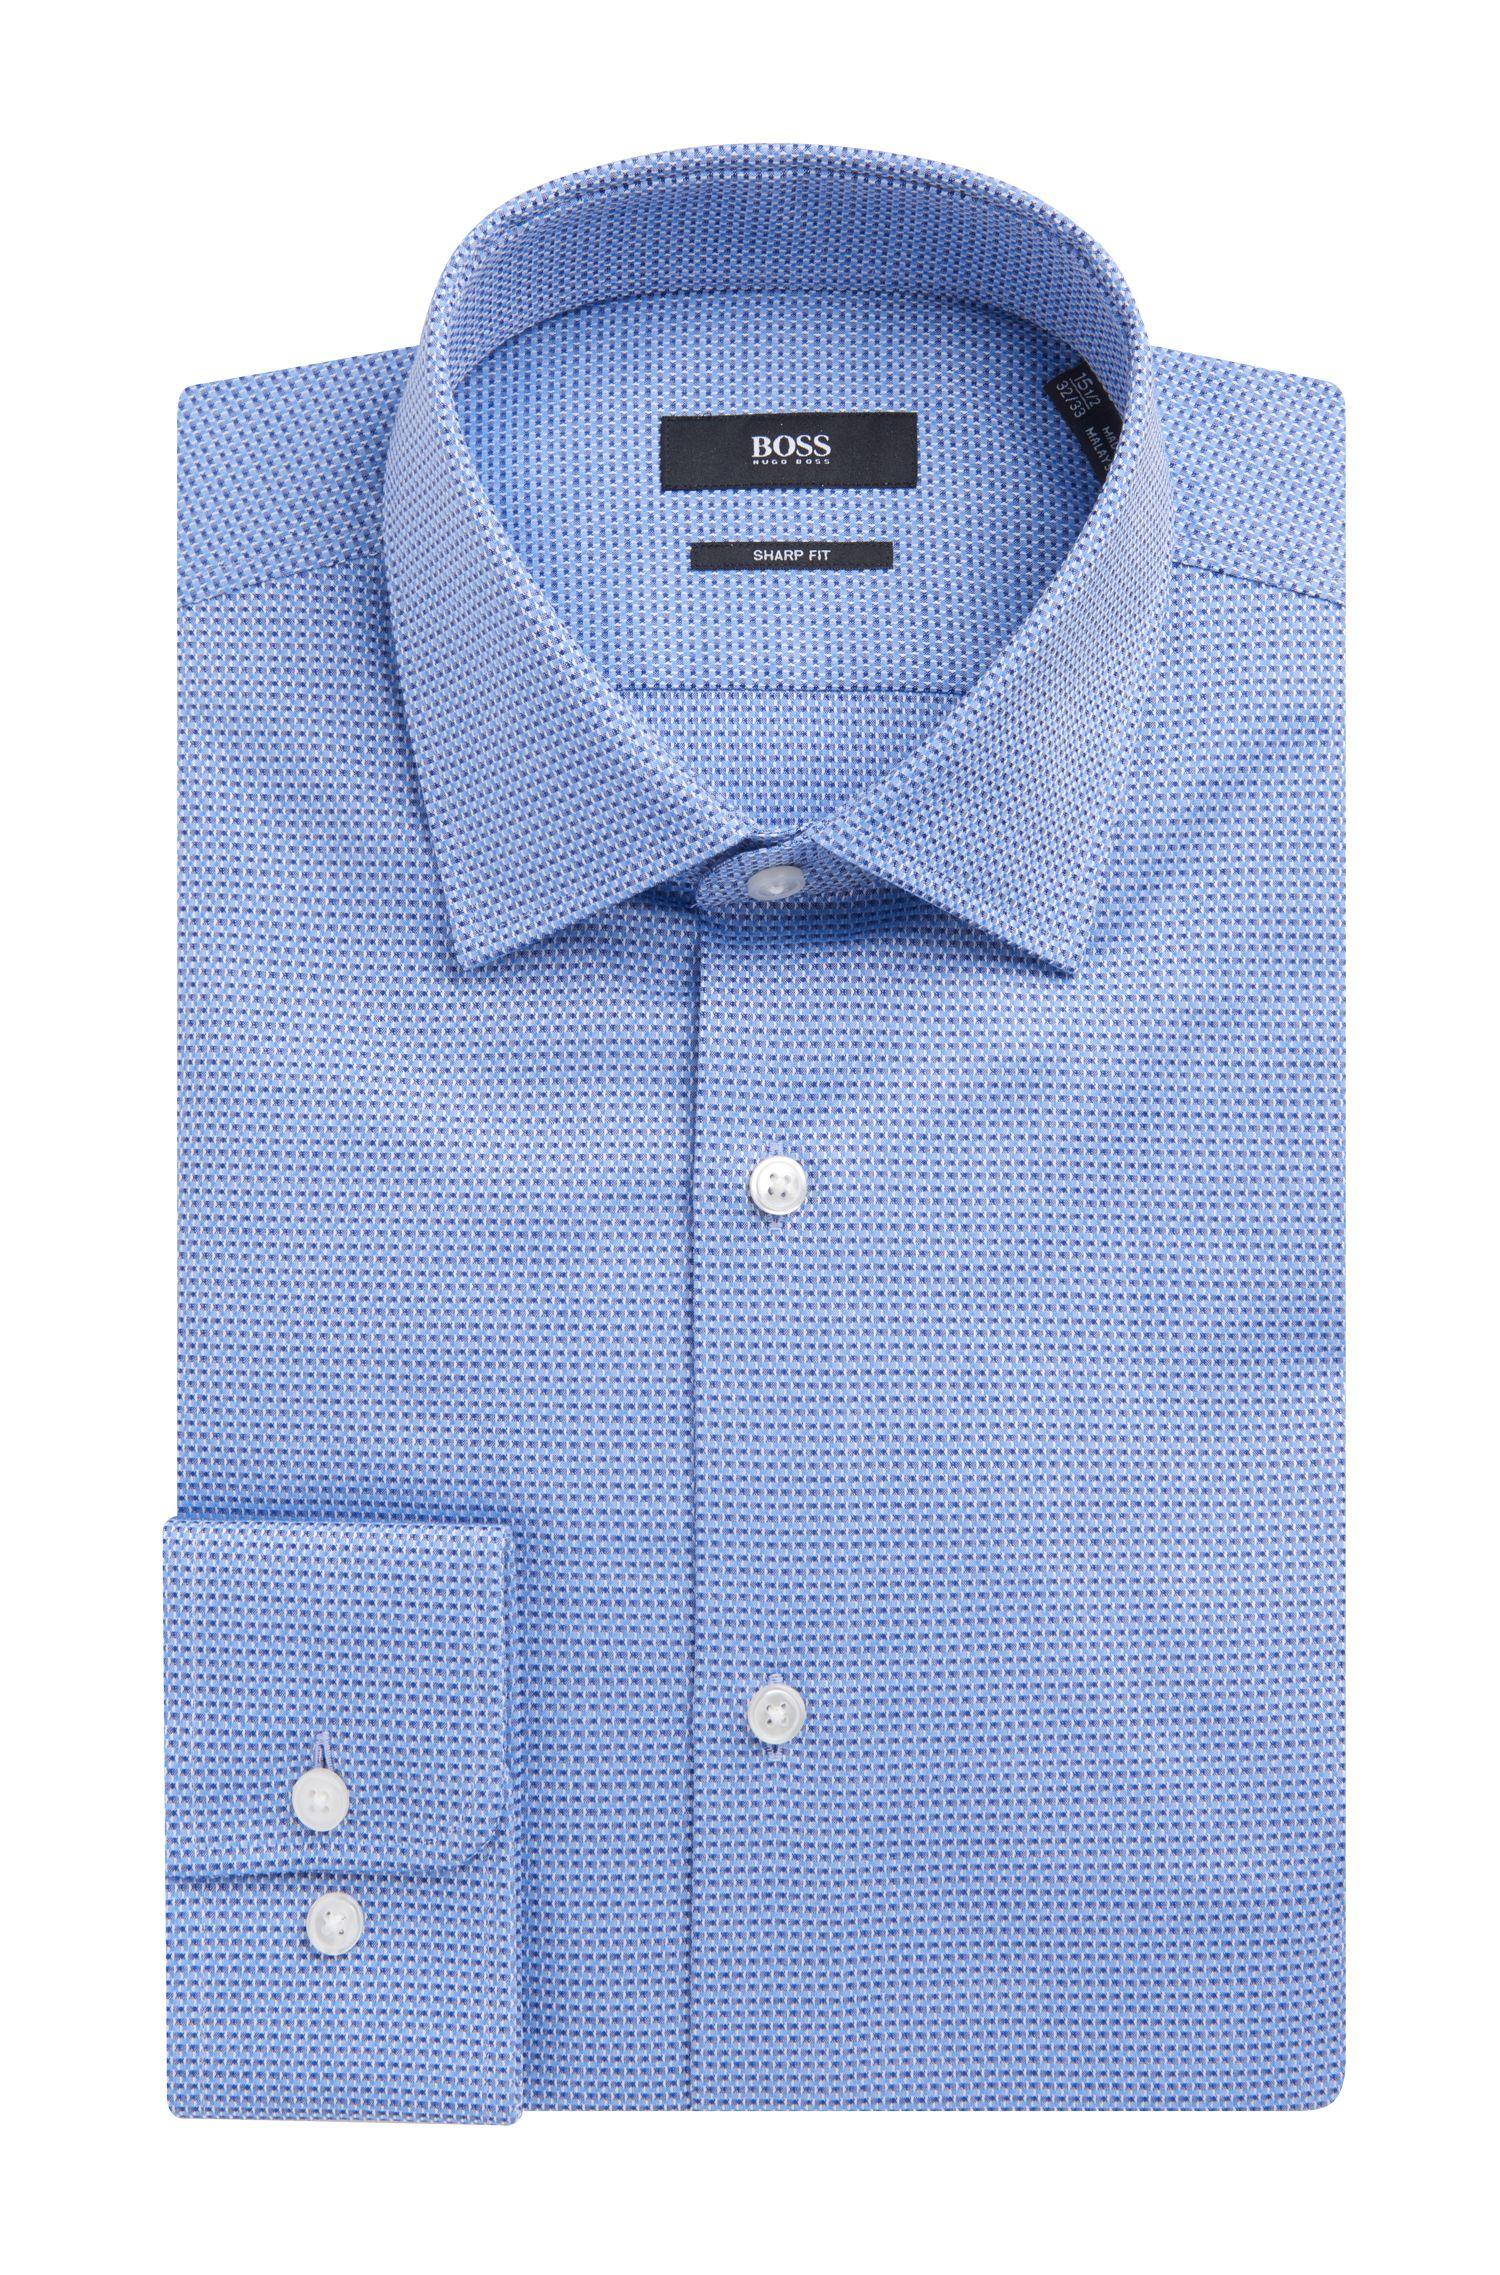 Basketweave Cotton Dress Shirt, Sharp Fit | Marley US